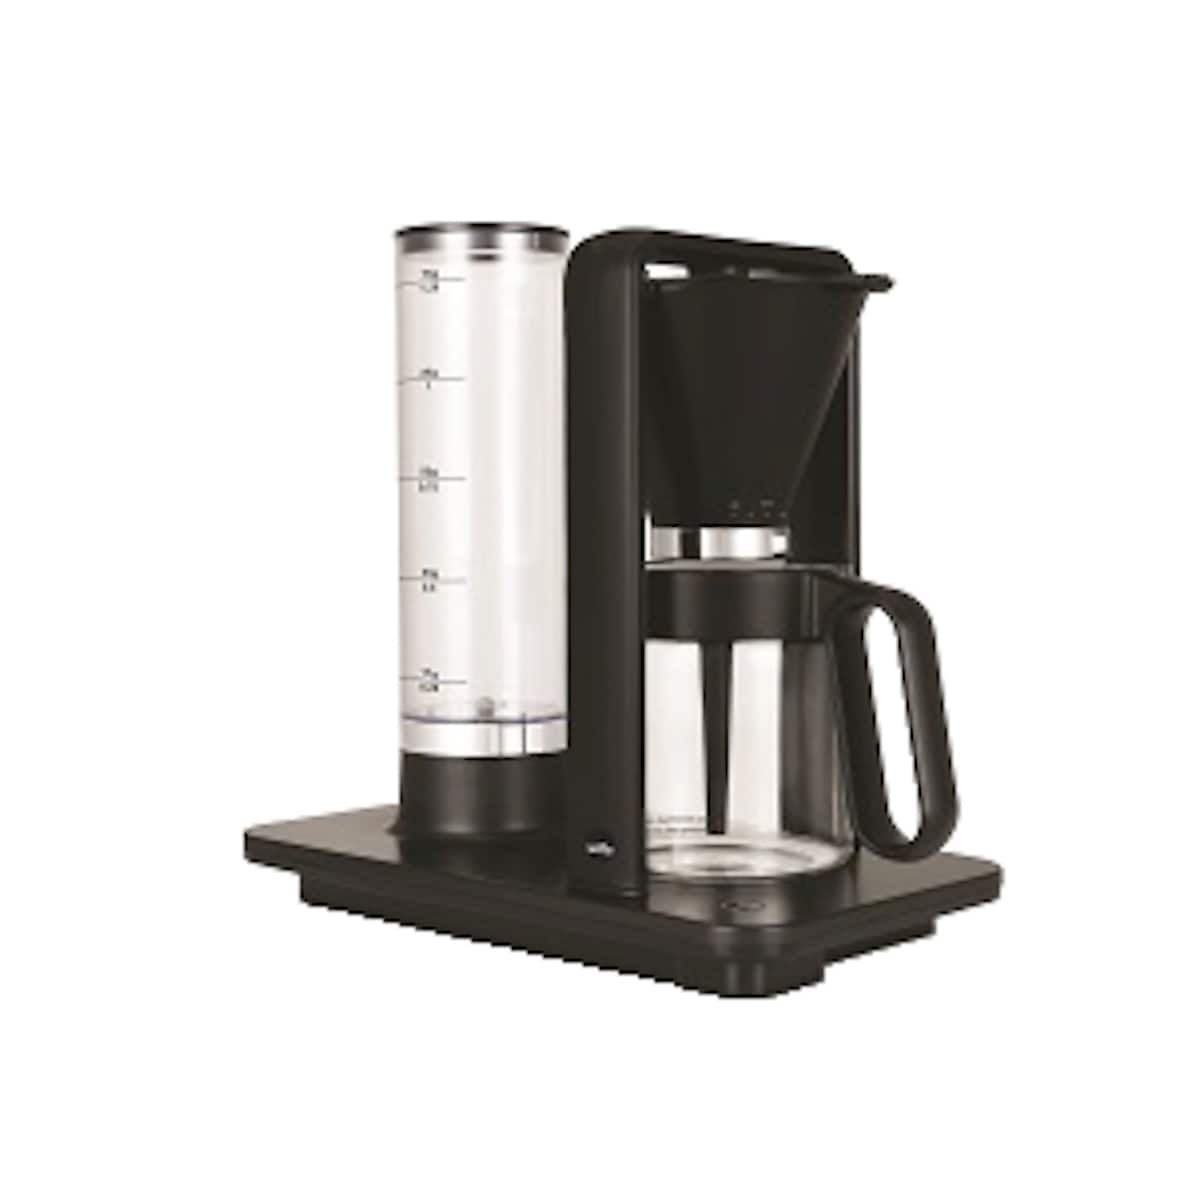 Kaffebryggare Svart Presisjon Wilfa